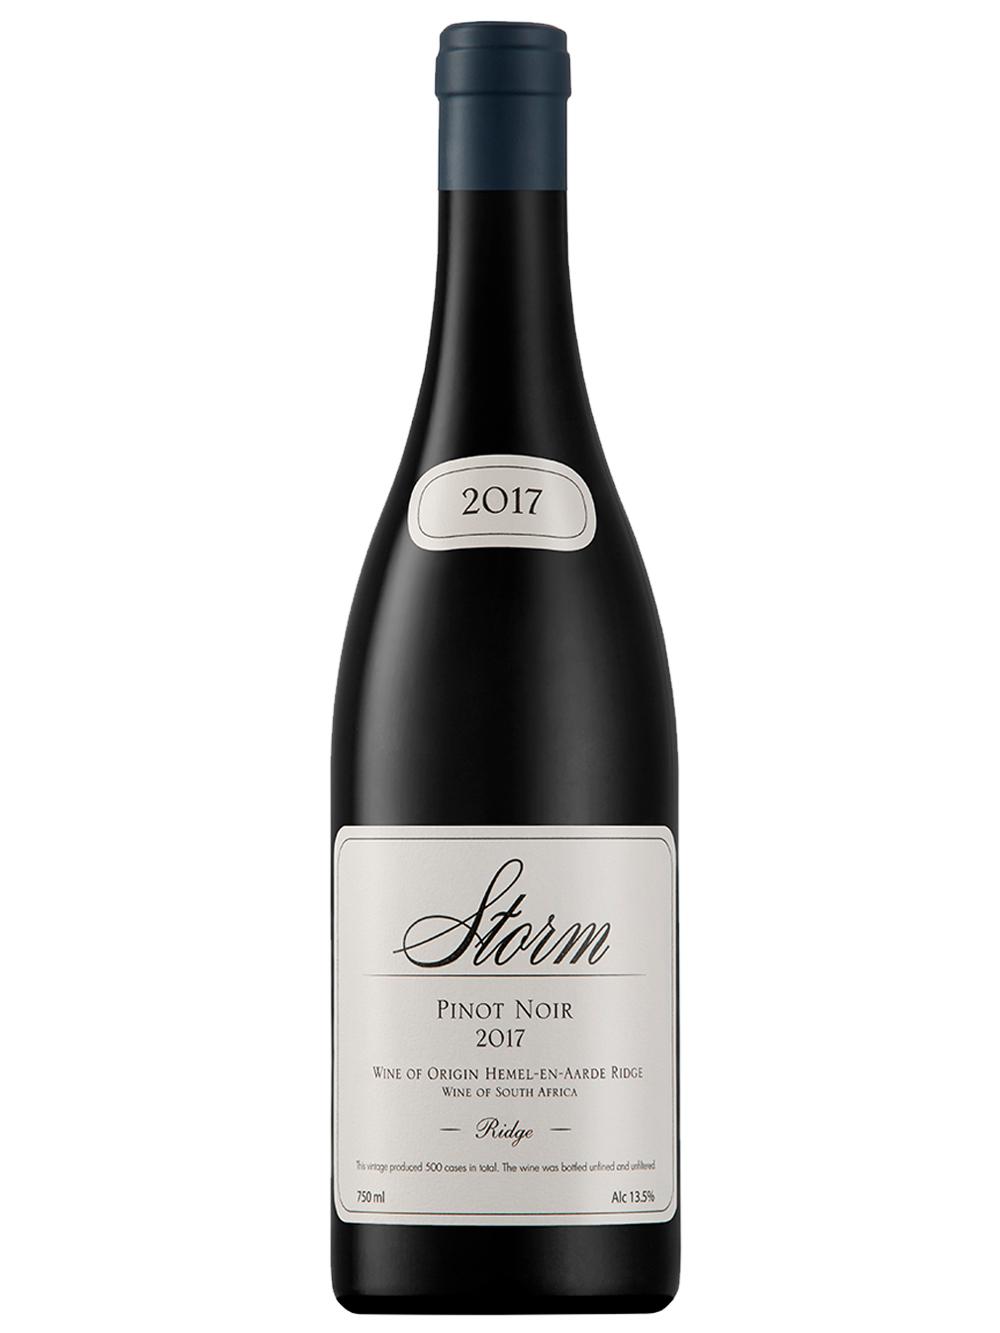 2017 Ridge Pinot Noir